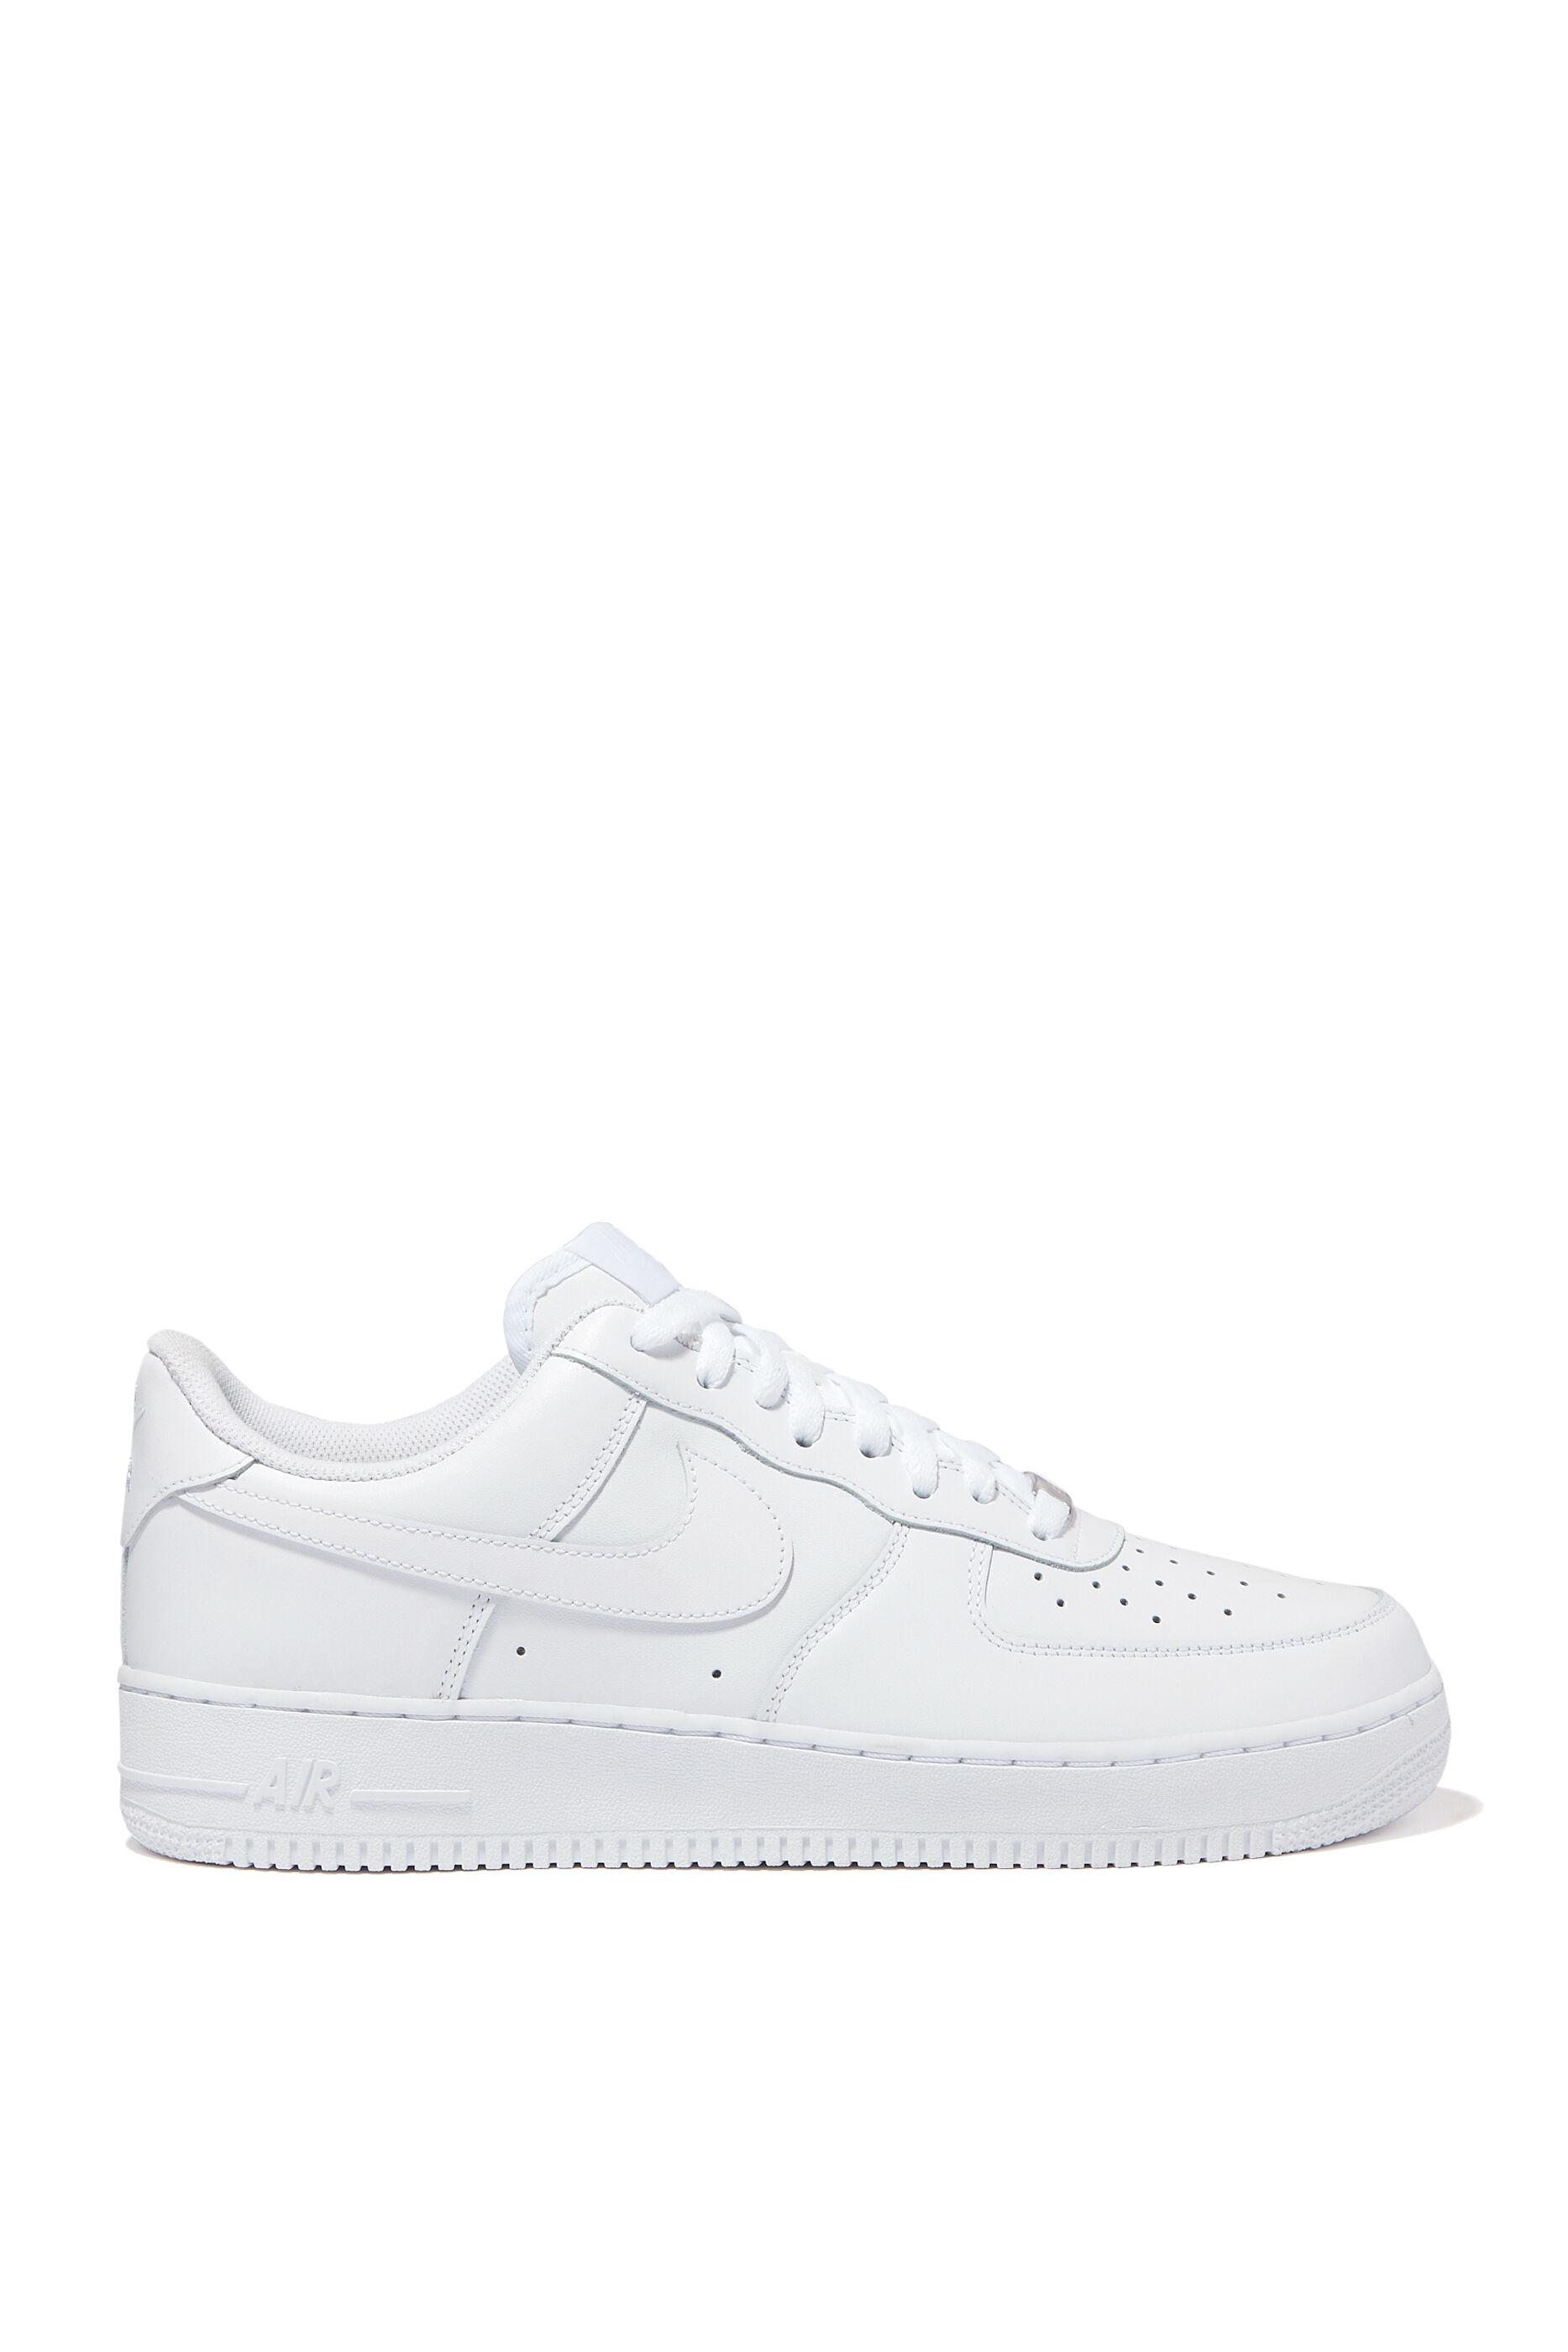 Buy Nike Air Force 1 Sneakers - Mens